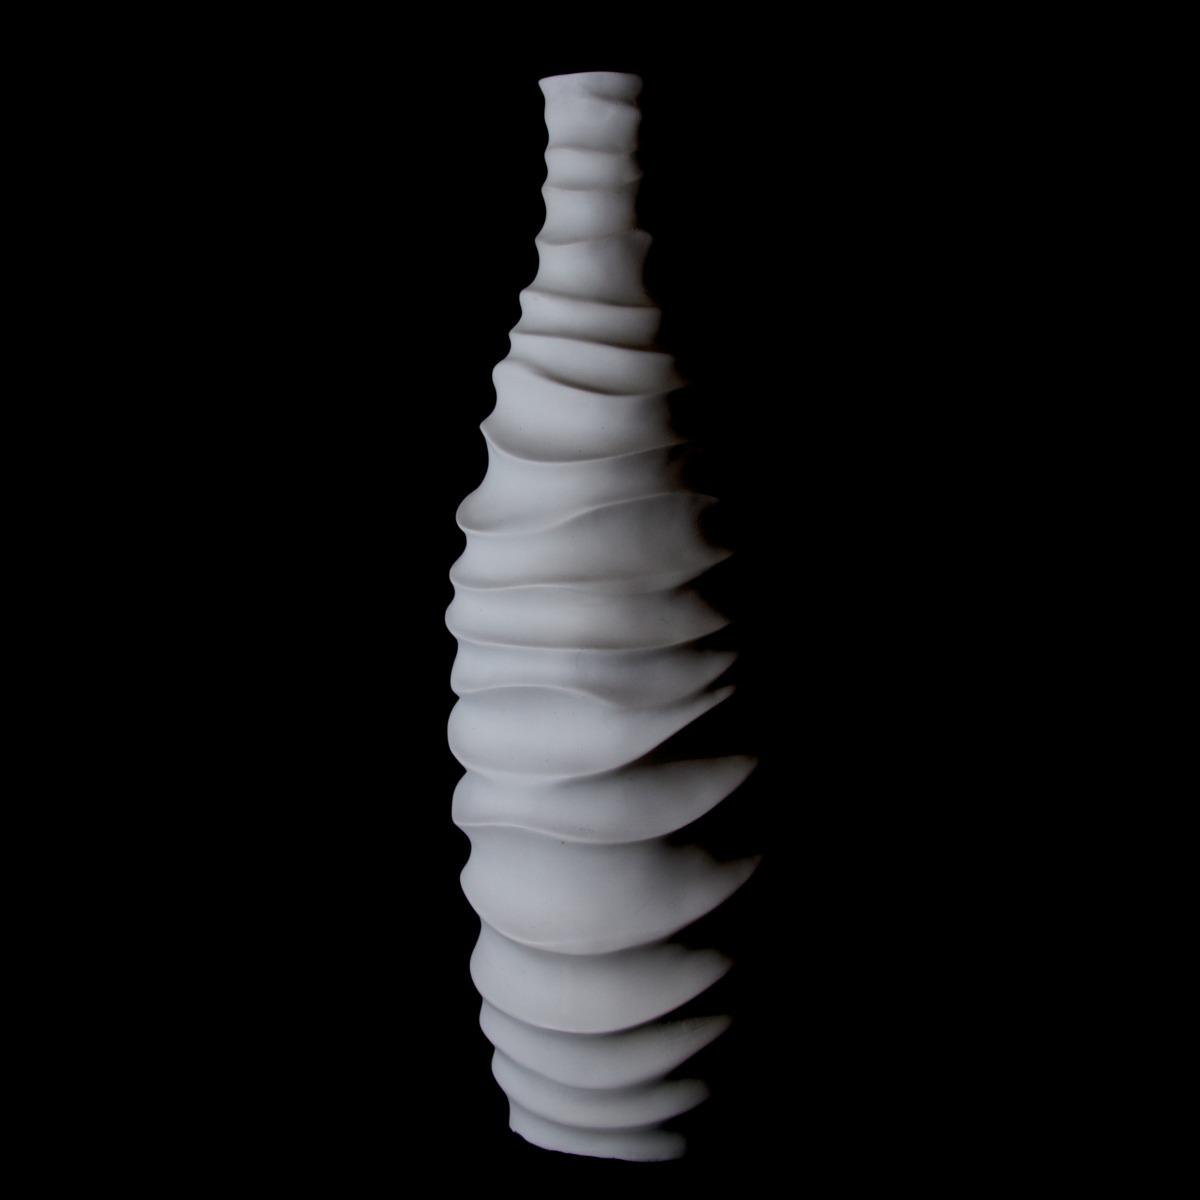 2011-12-24 at 15-43-04 still life white vase light shadow bone waves.jpg